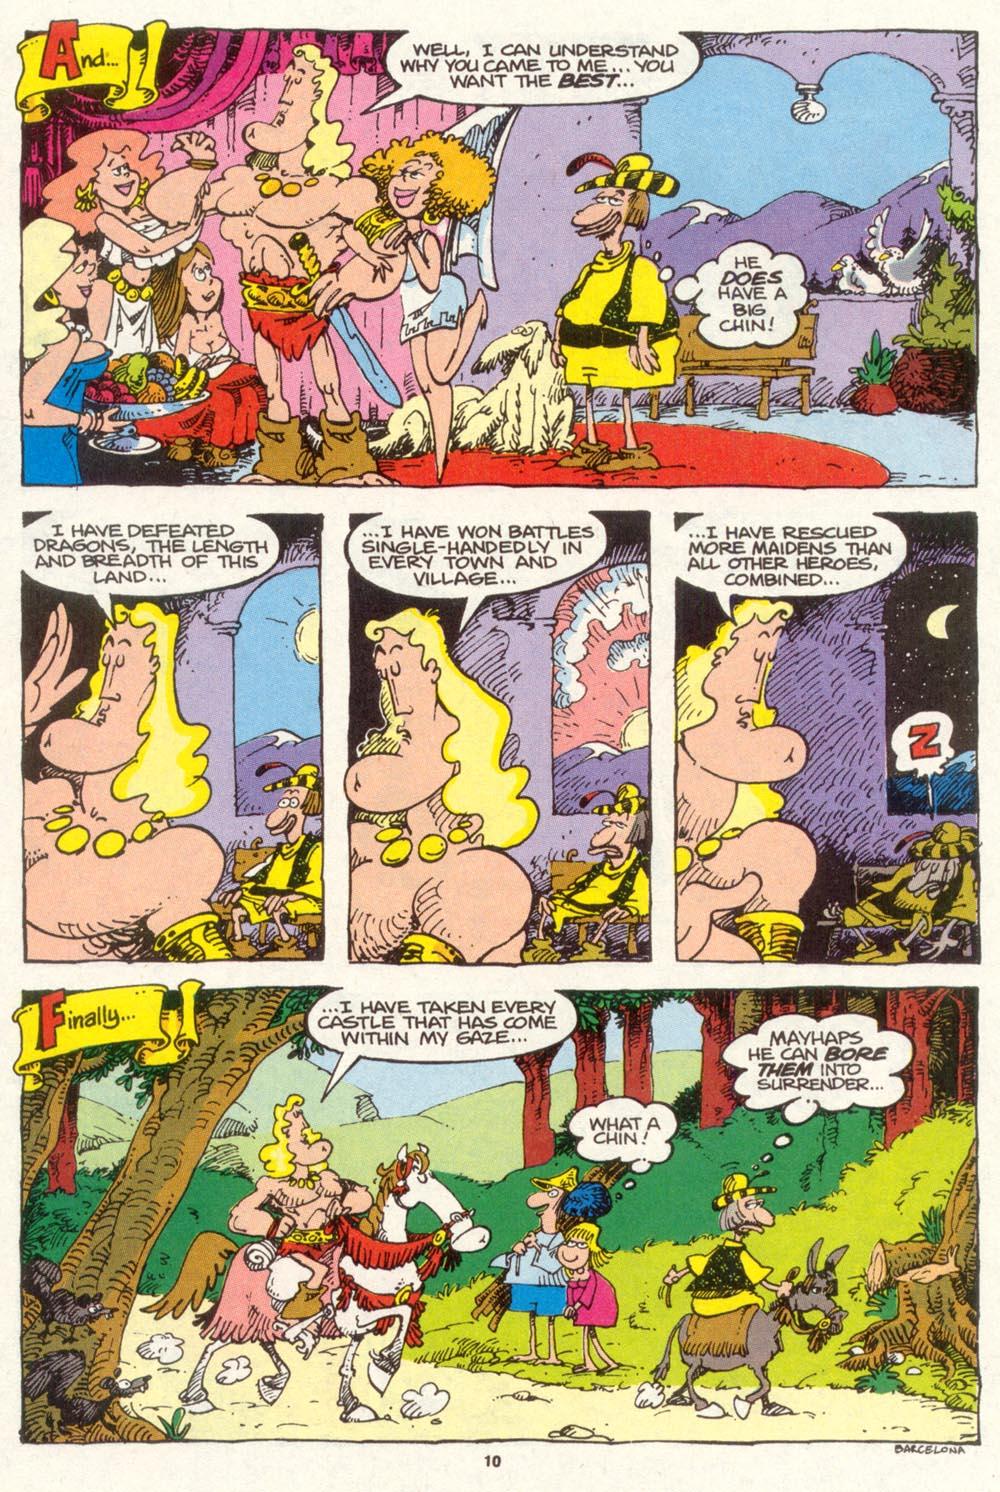 Read online Sergio Aragonés Groo the Wanderer comic -  Issue #89 - 11